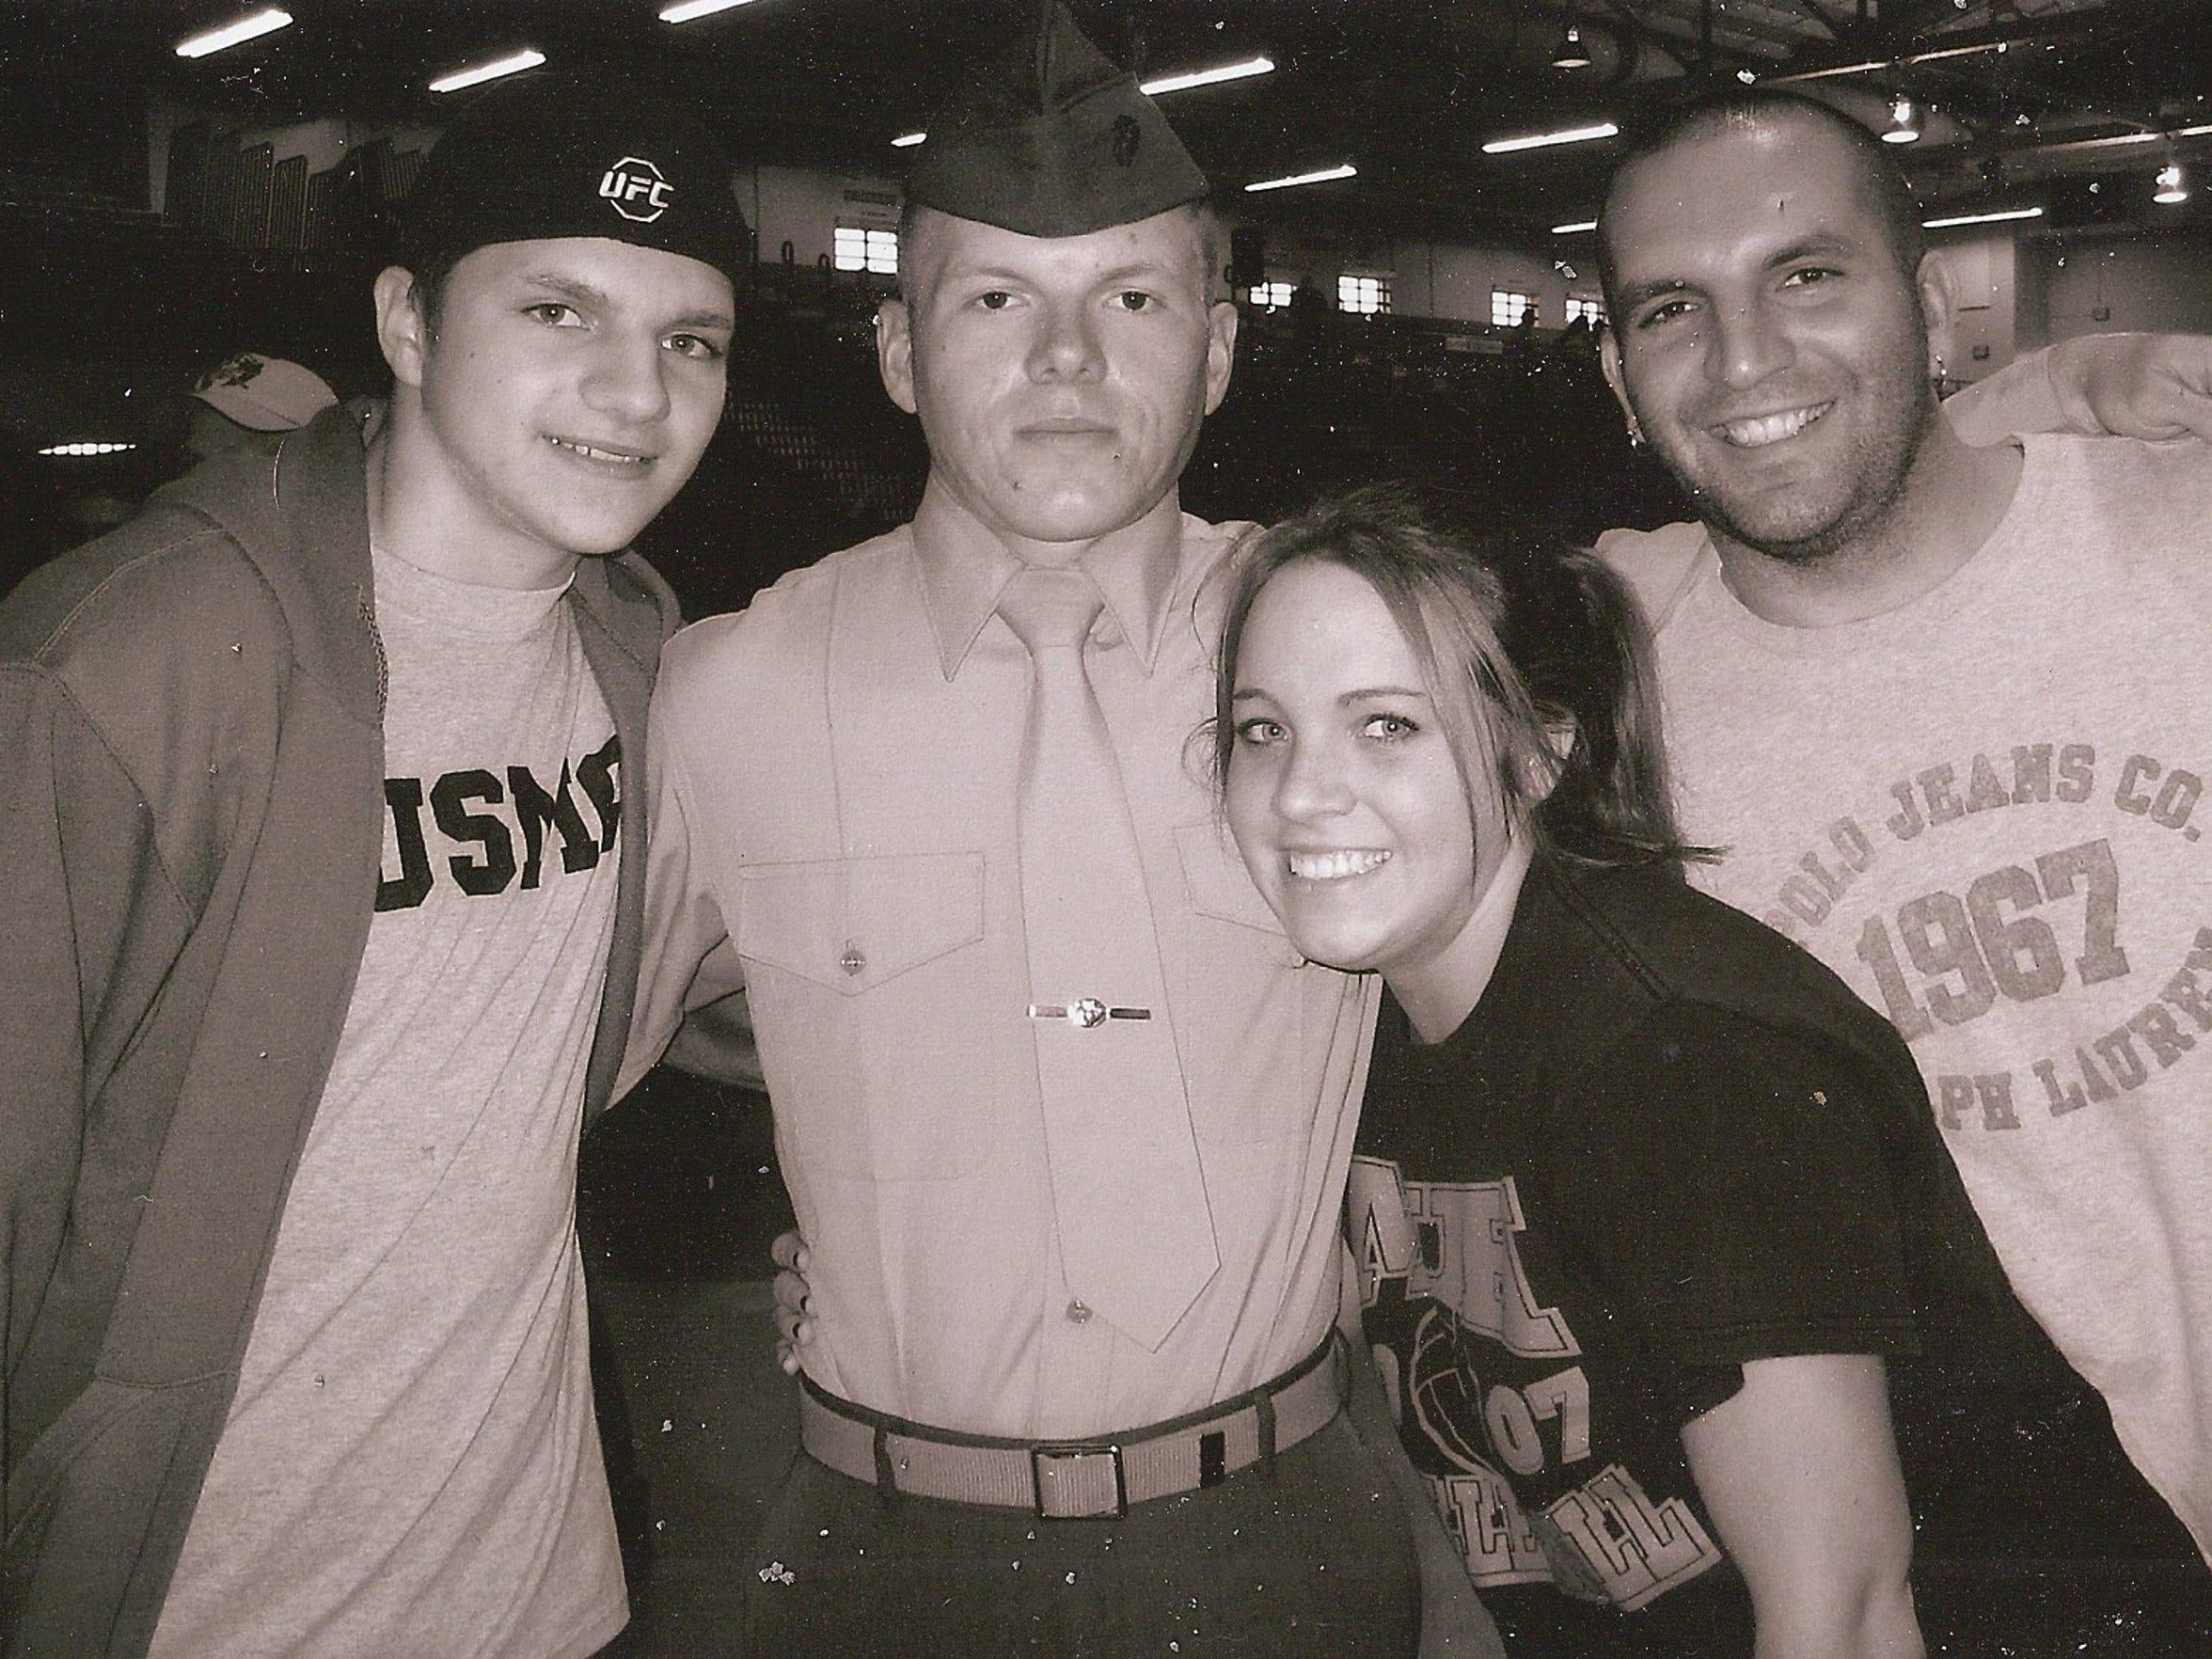 Marine veteran Jacob Faulkner, center, pictured in uniform with his family.